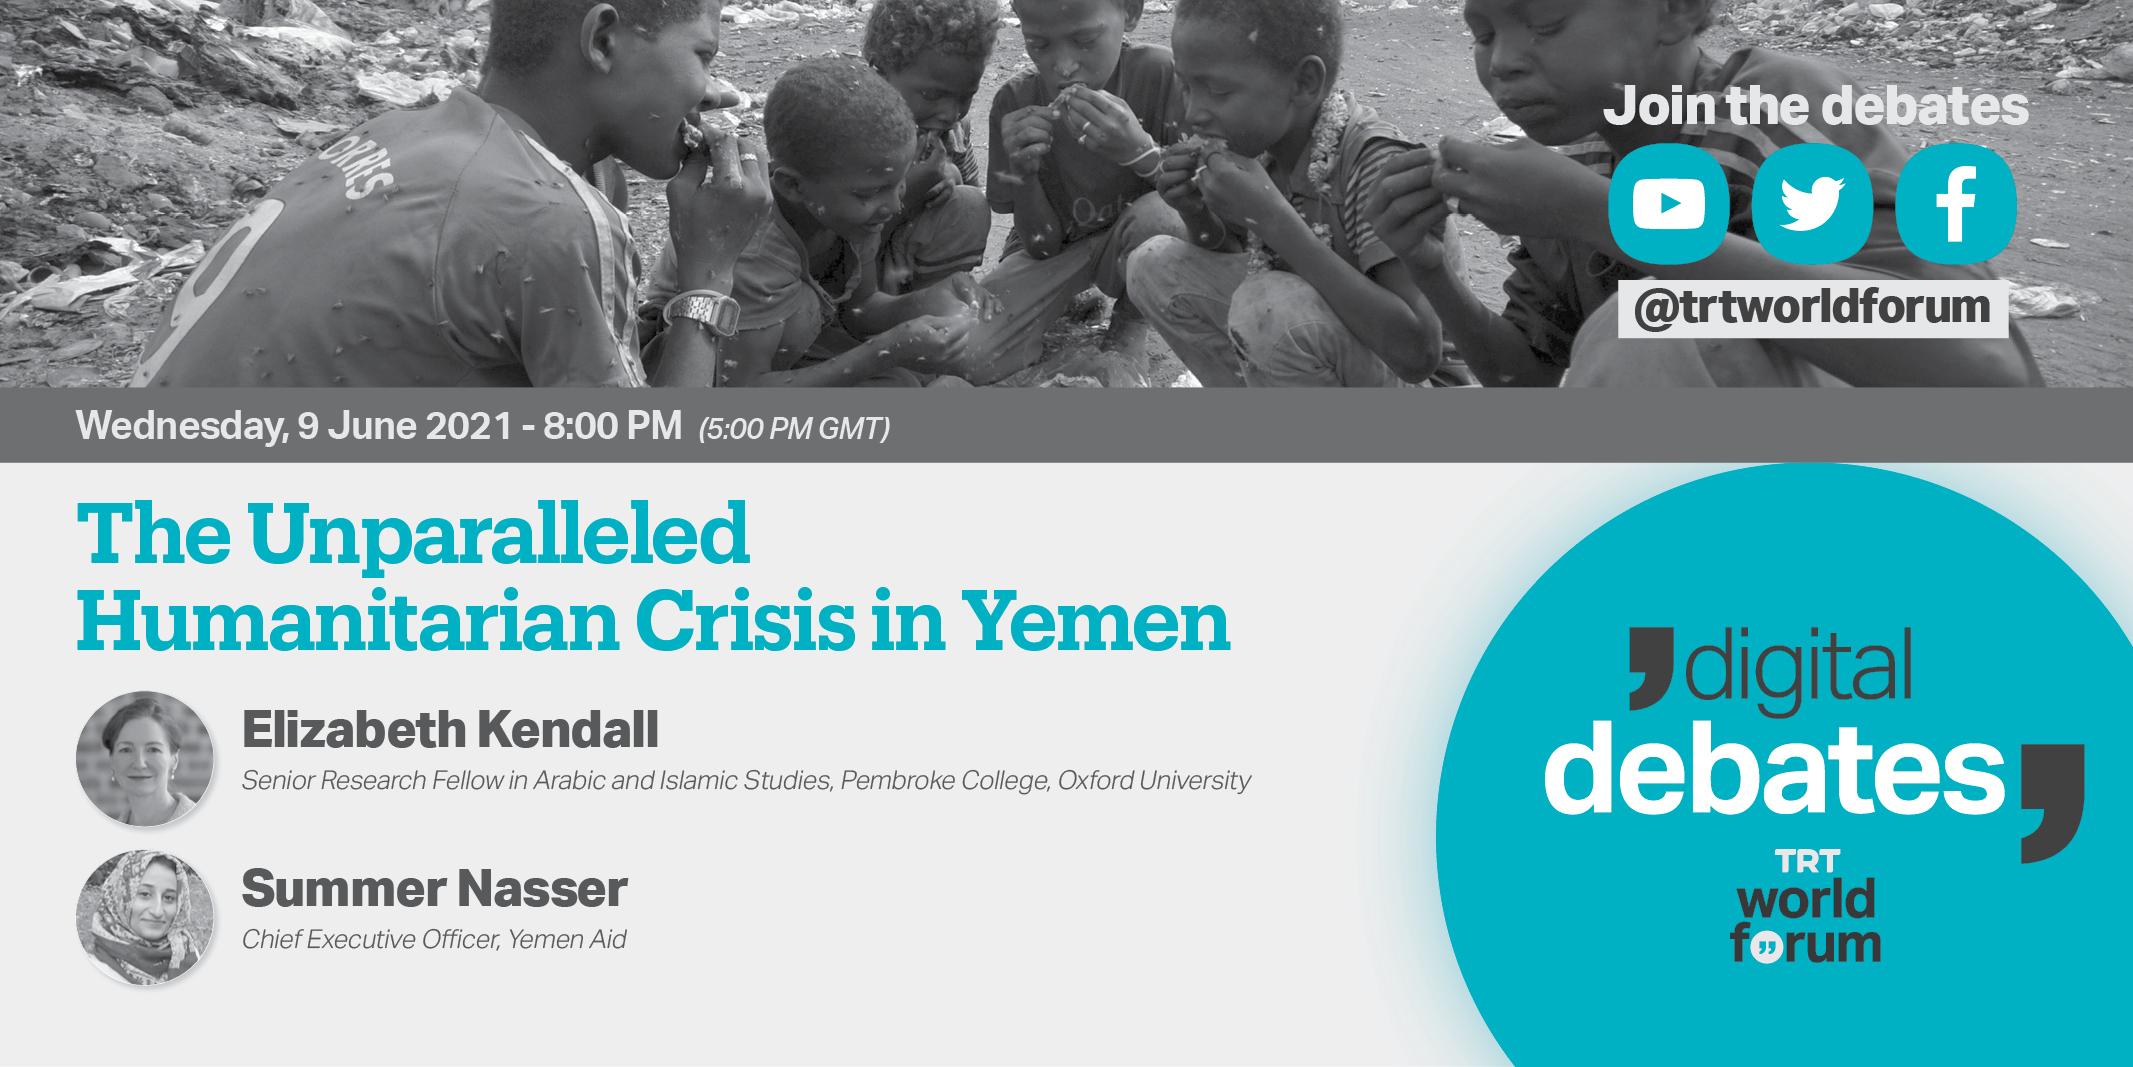 The Unparalleled Humanitarian Crisis in Yemen